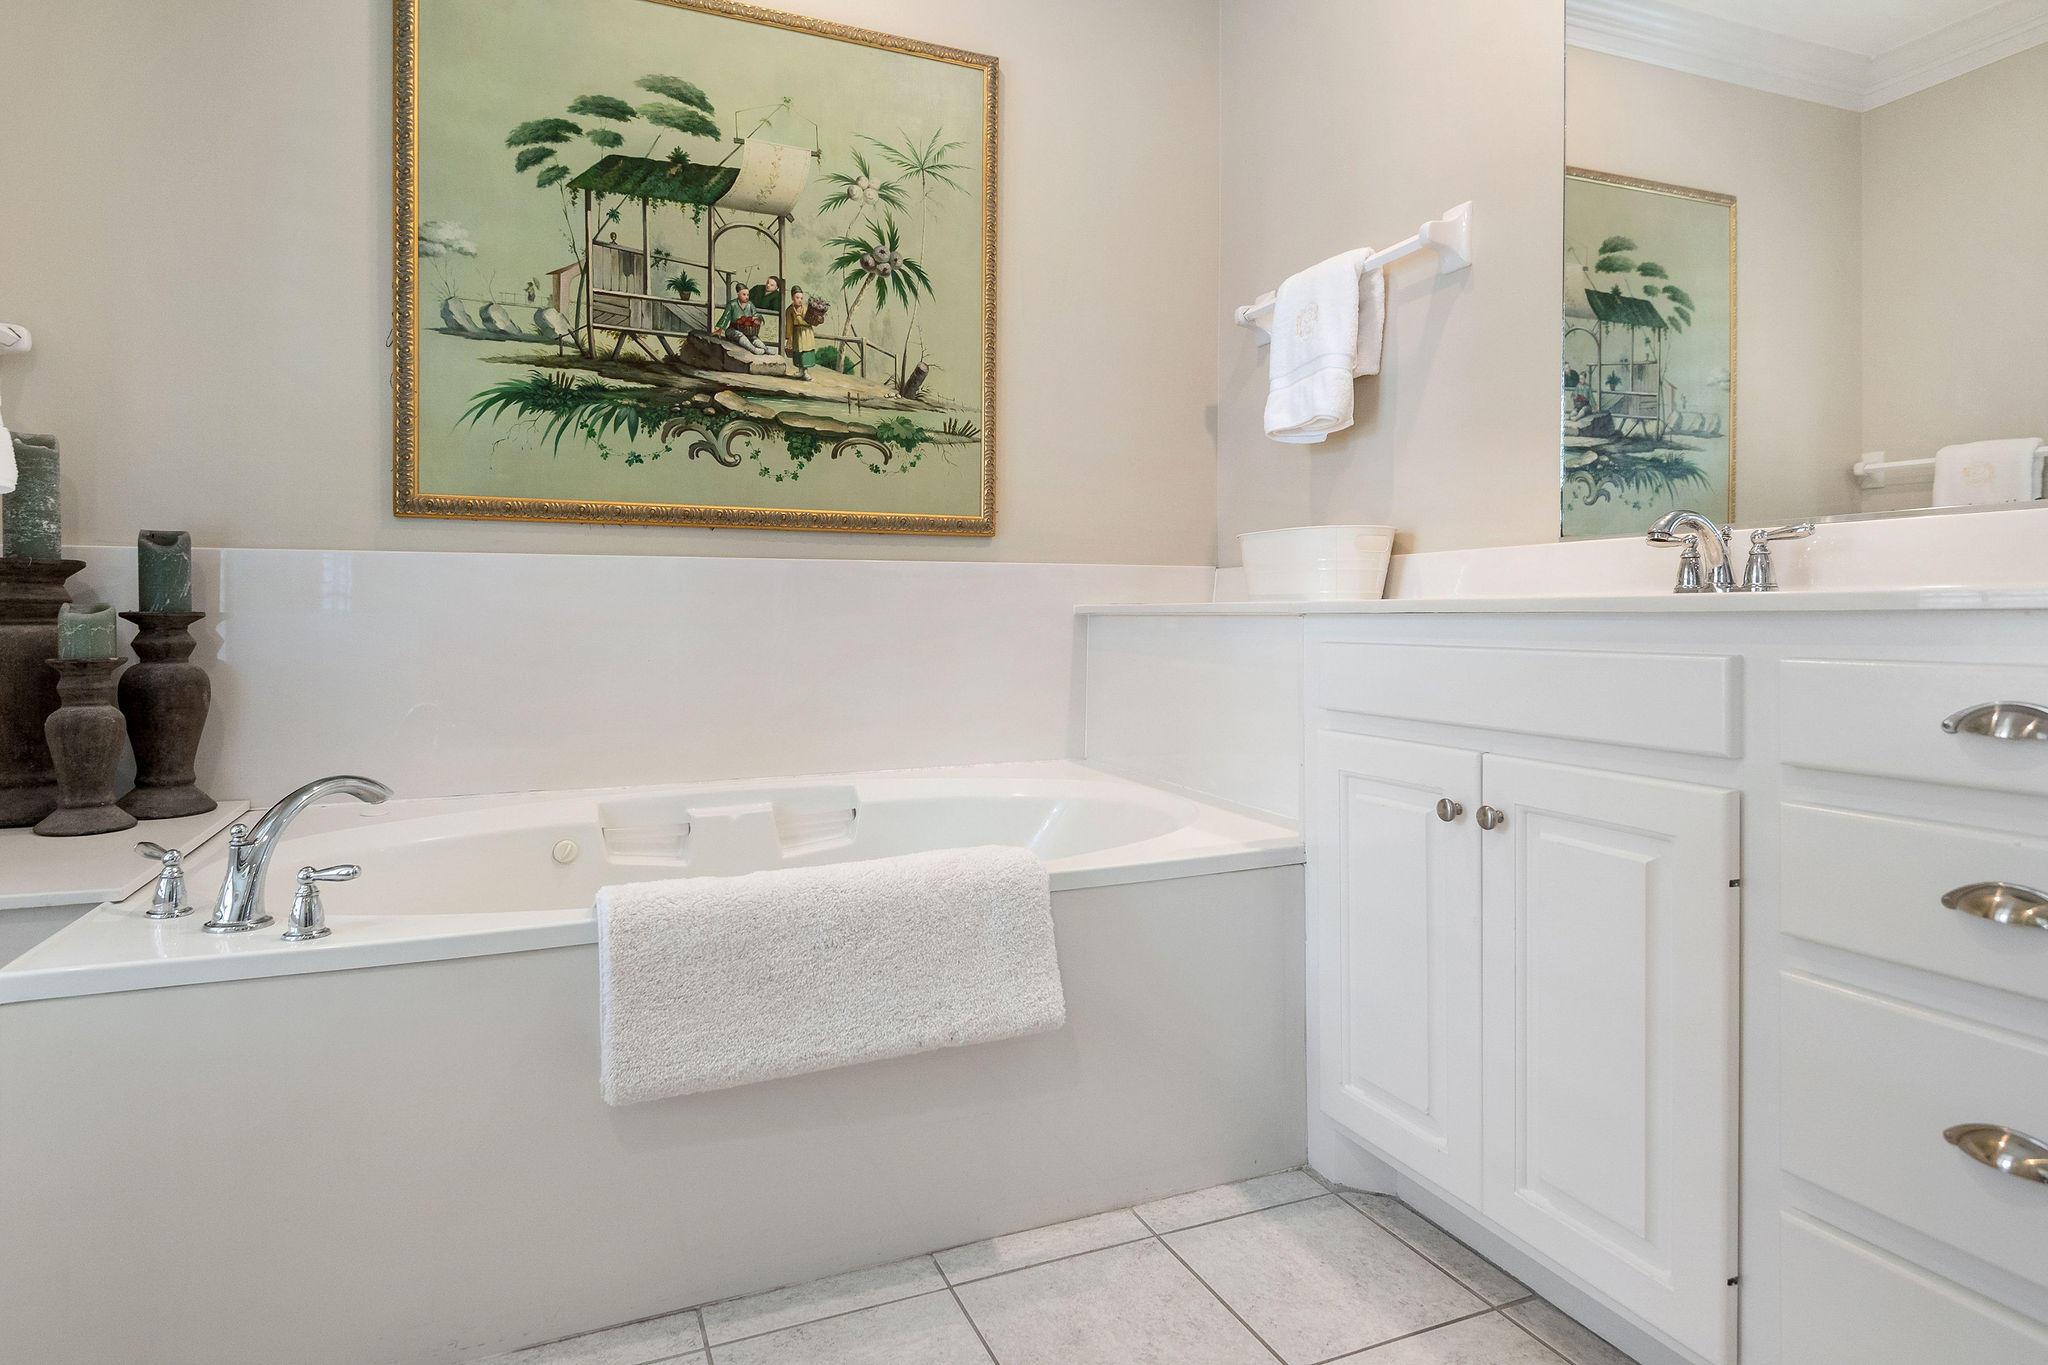 Country Club II Homes For Sale - 1482 Burningtree, Charleston, SC - 34